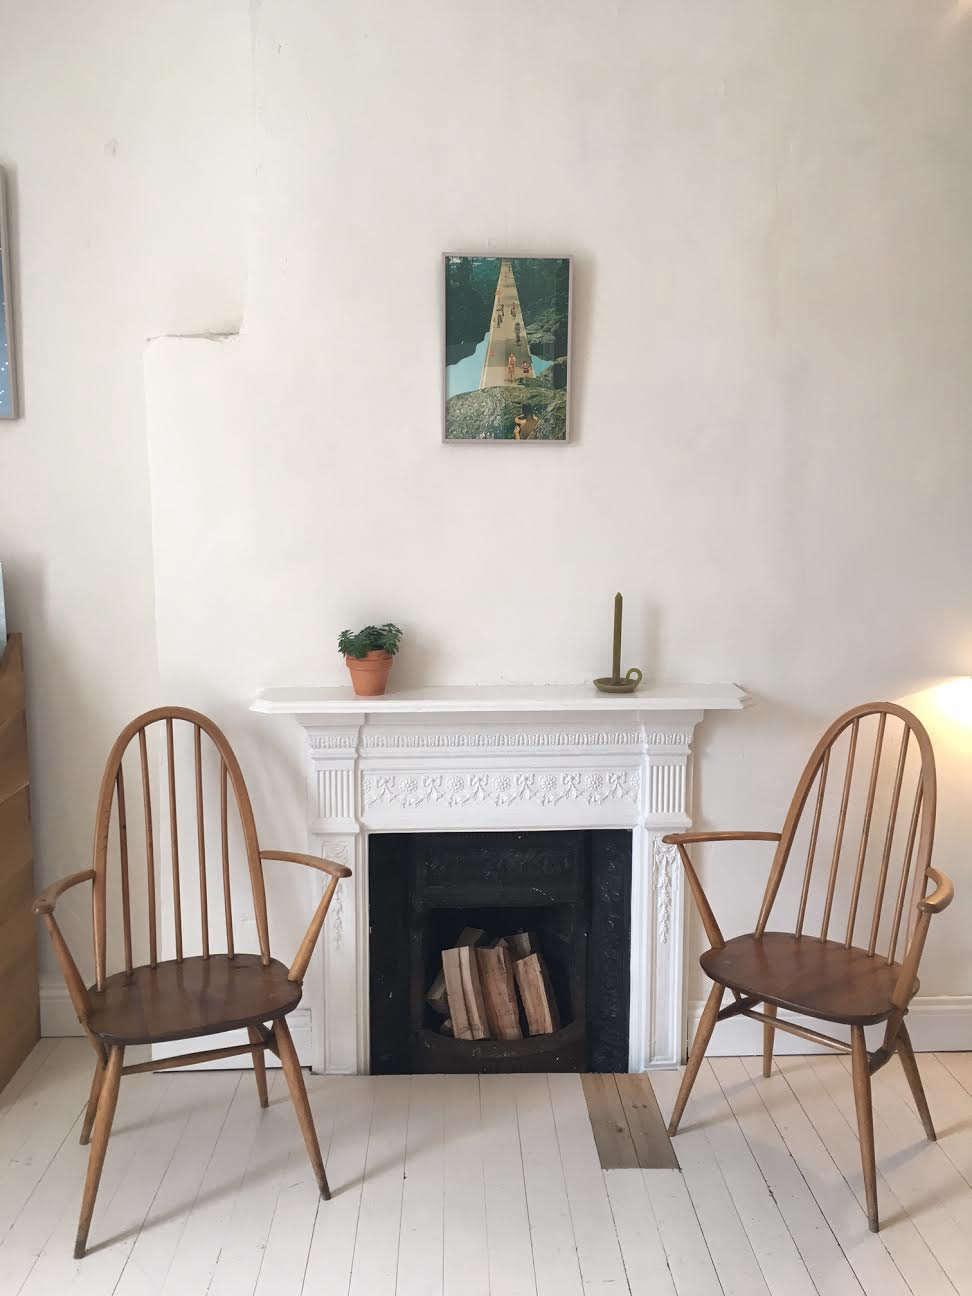 coffeewerk + press fireplace and chairs 15